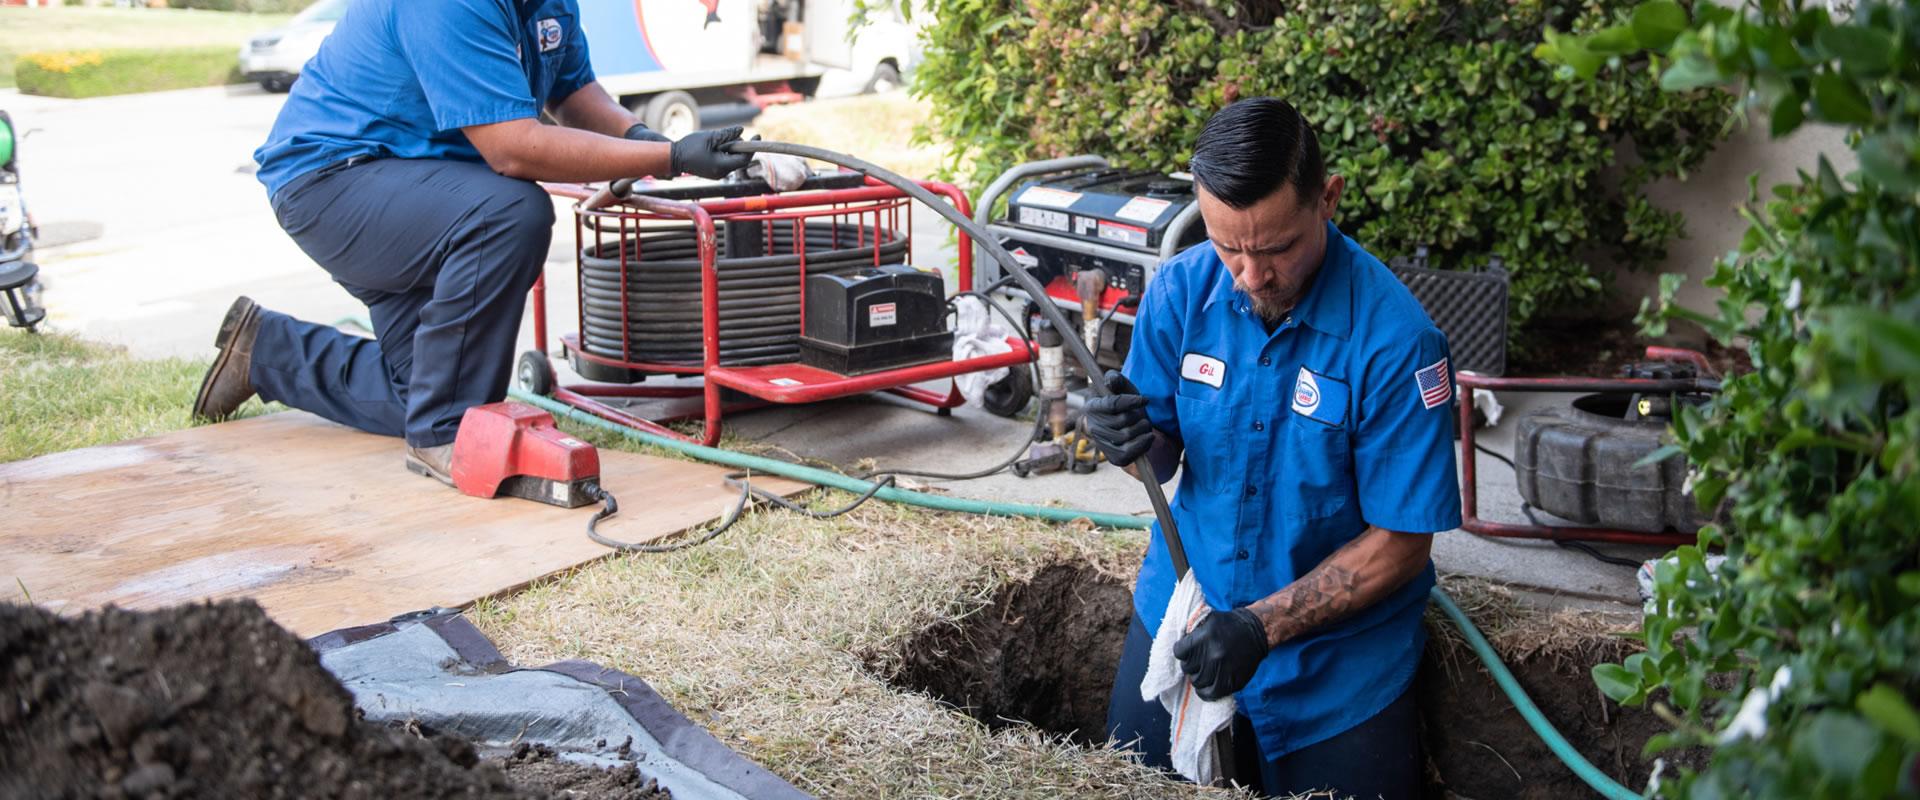 Drain Cleaning in Avondale, AZ